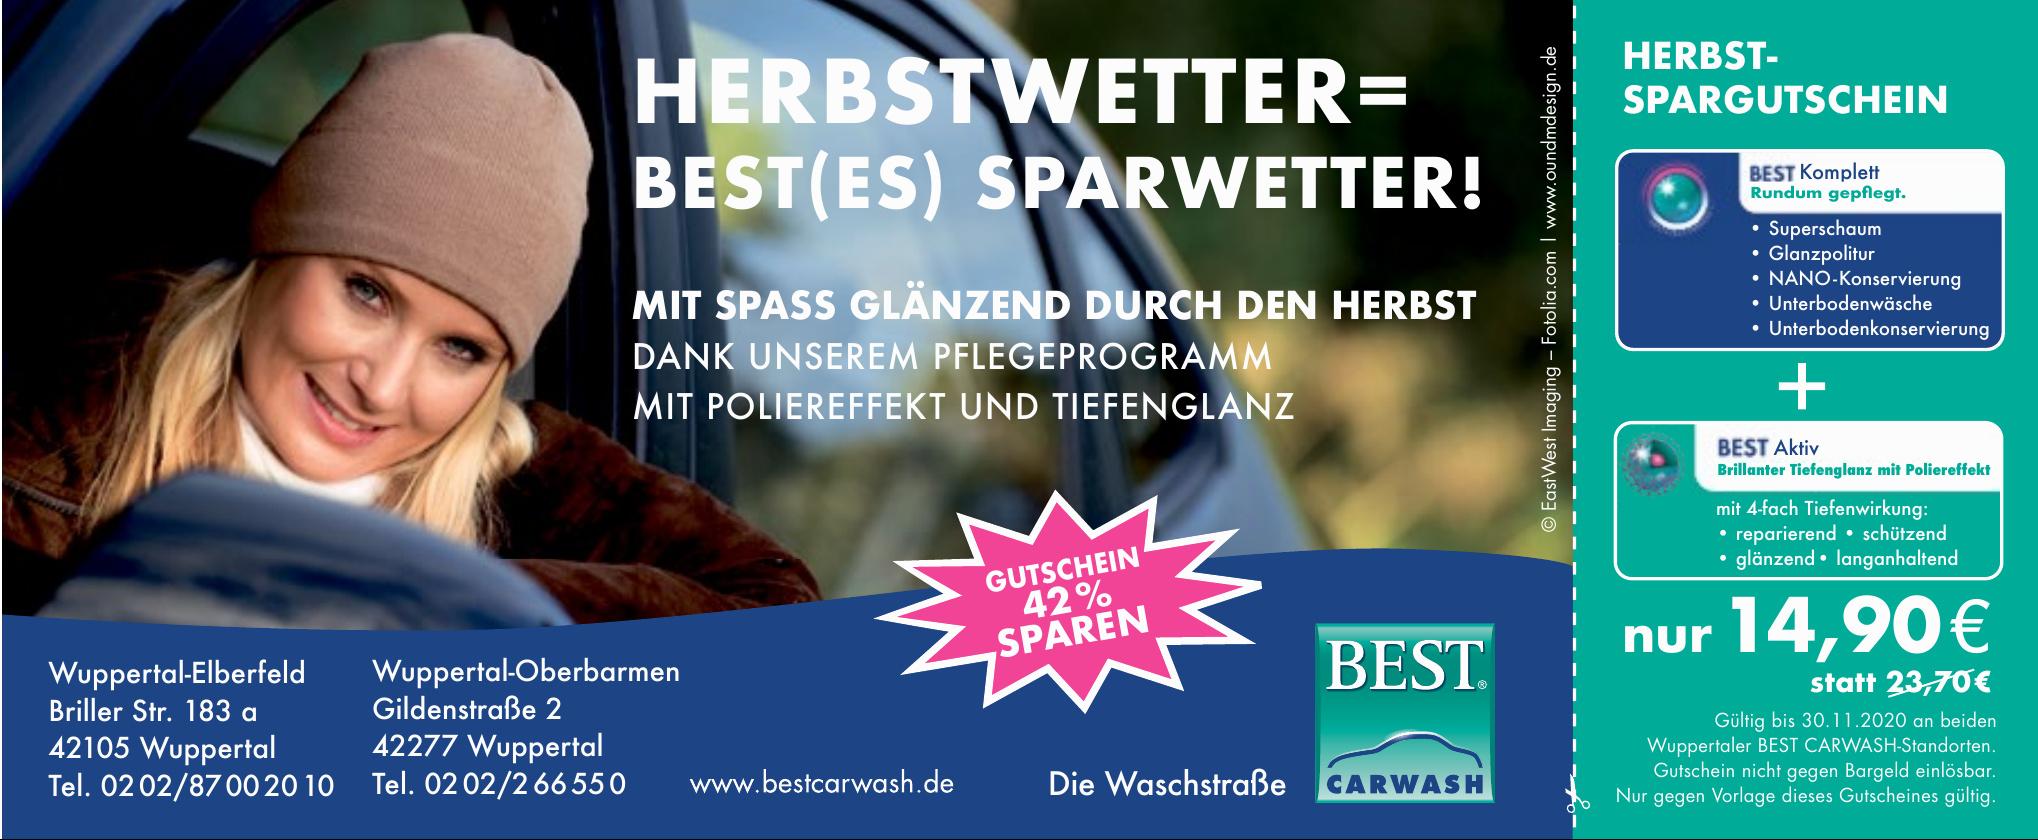 Best Carwasch - Wuppertal-Elberfeld